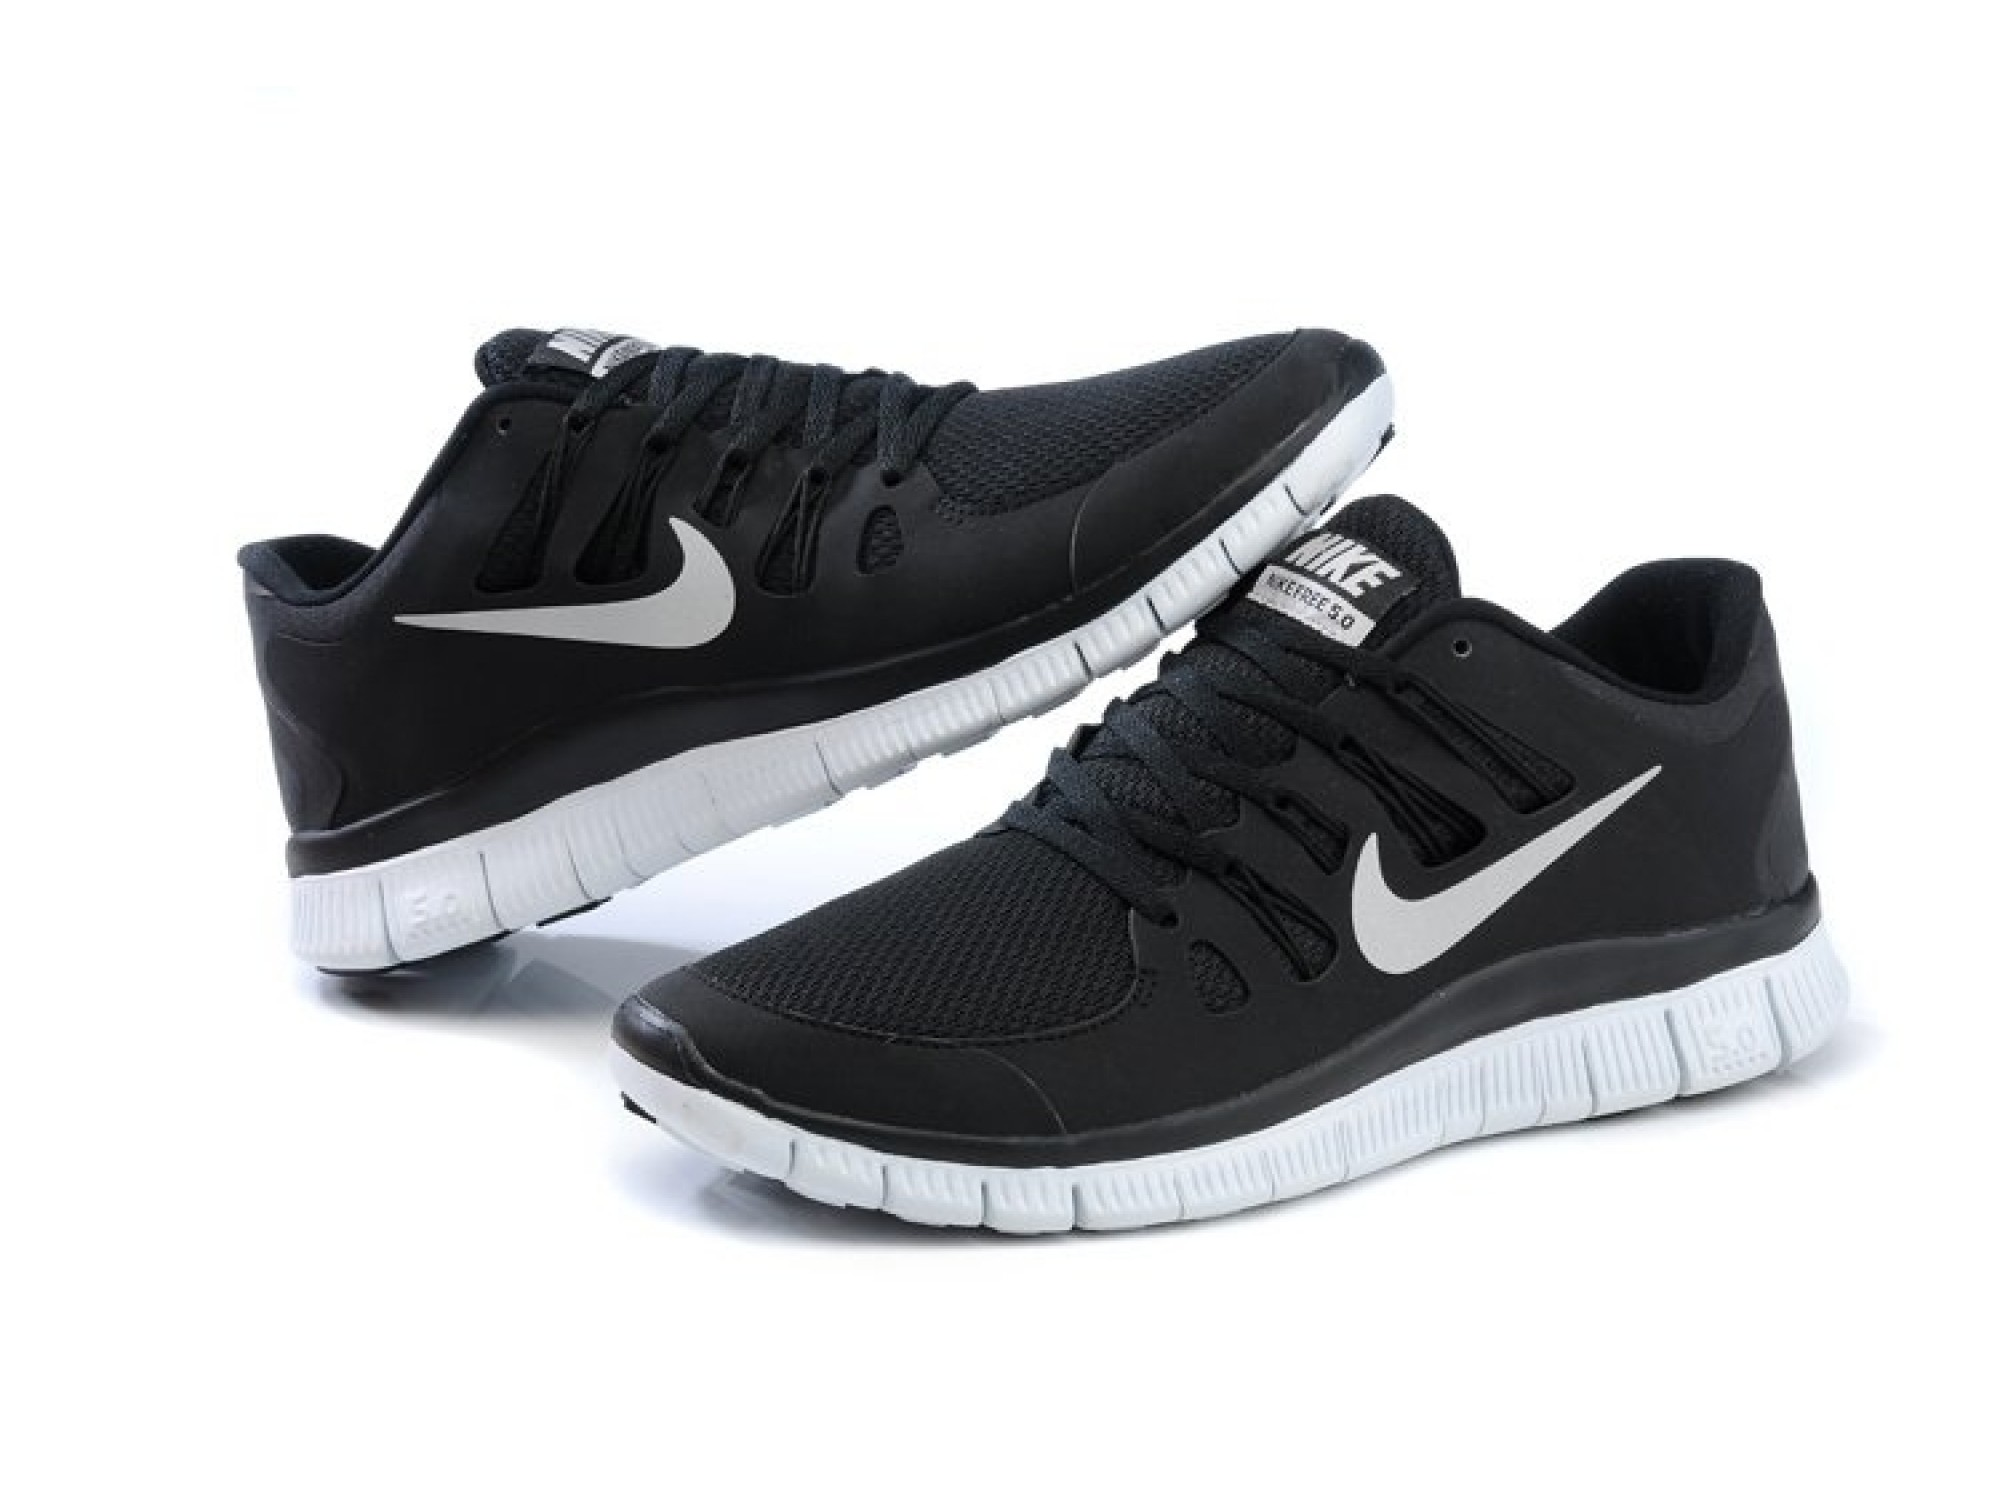 a3e96228 Nike Free Run 5.0 2013 (Black) Беговые кроссовки купить в Украине ...